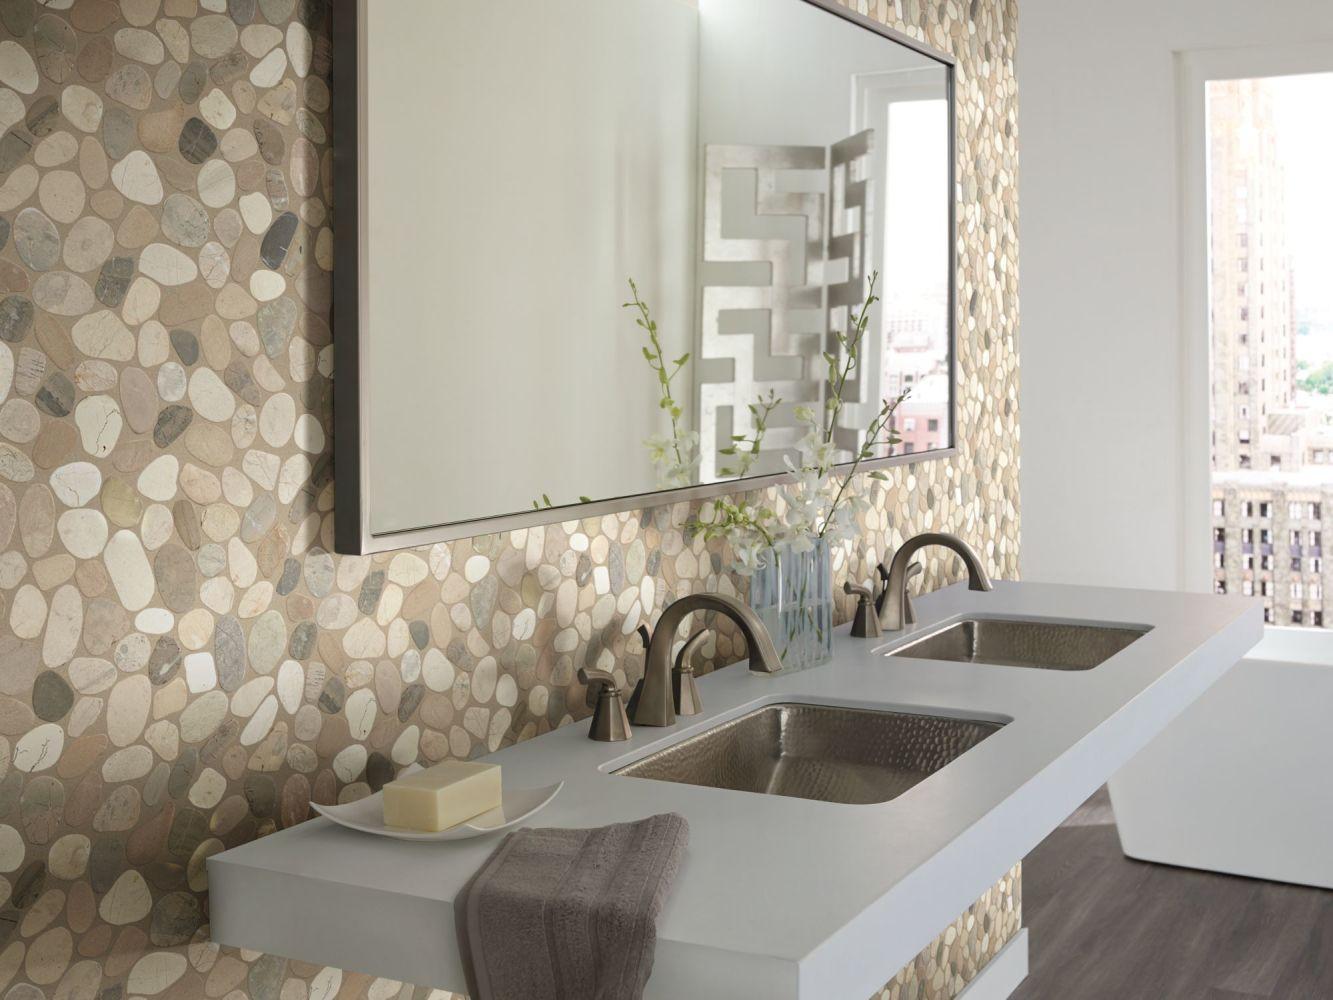 Shaw Floors Home Fn Gold Ceramic River Rock Sliced Harmony Warm Blend 00125_TGL64